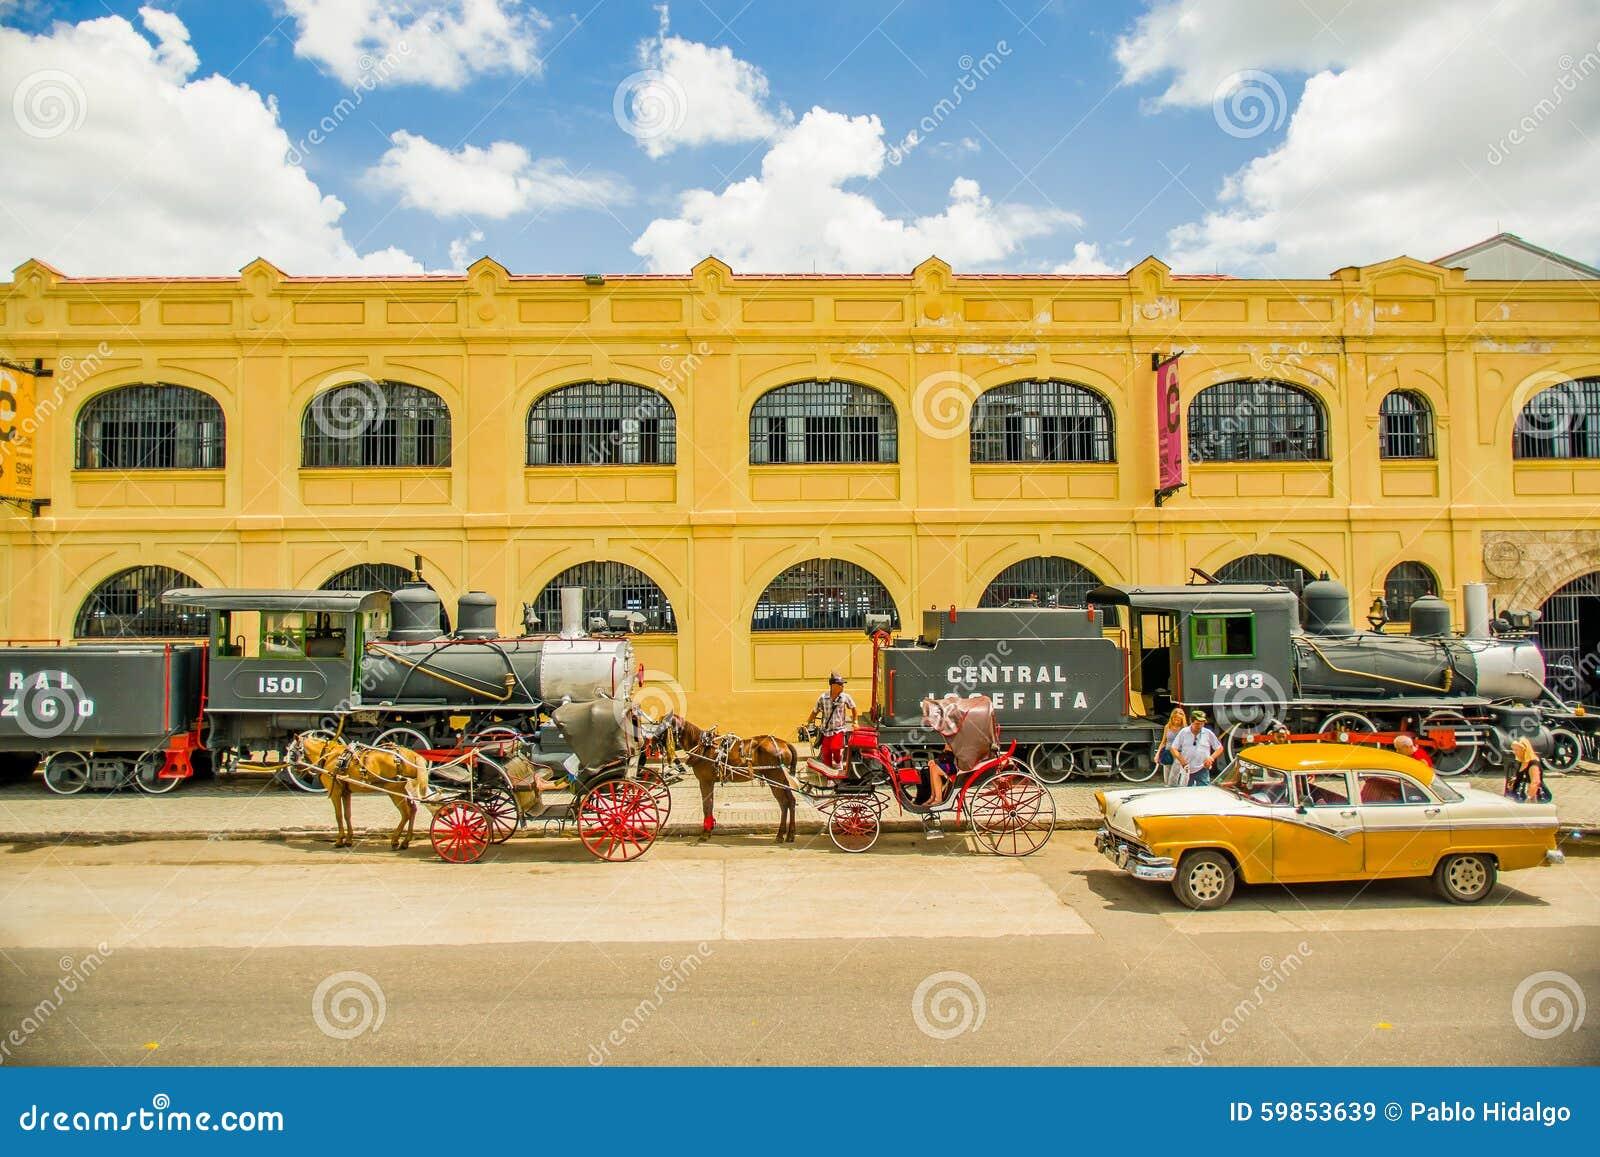 Colonial Auto Center >> Unesco Declared Historic Center Of Havana Royalty-Free Stock Photography | CartoonDealer.com ...